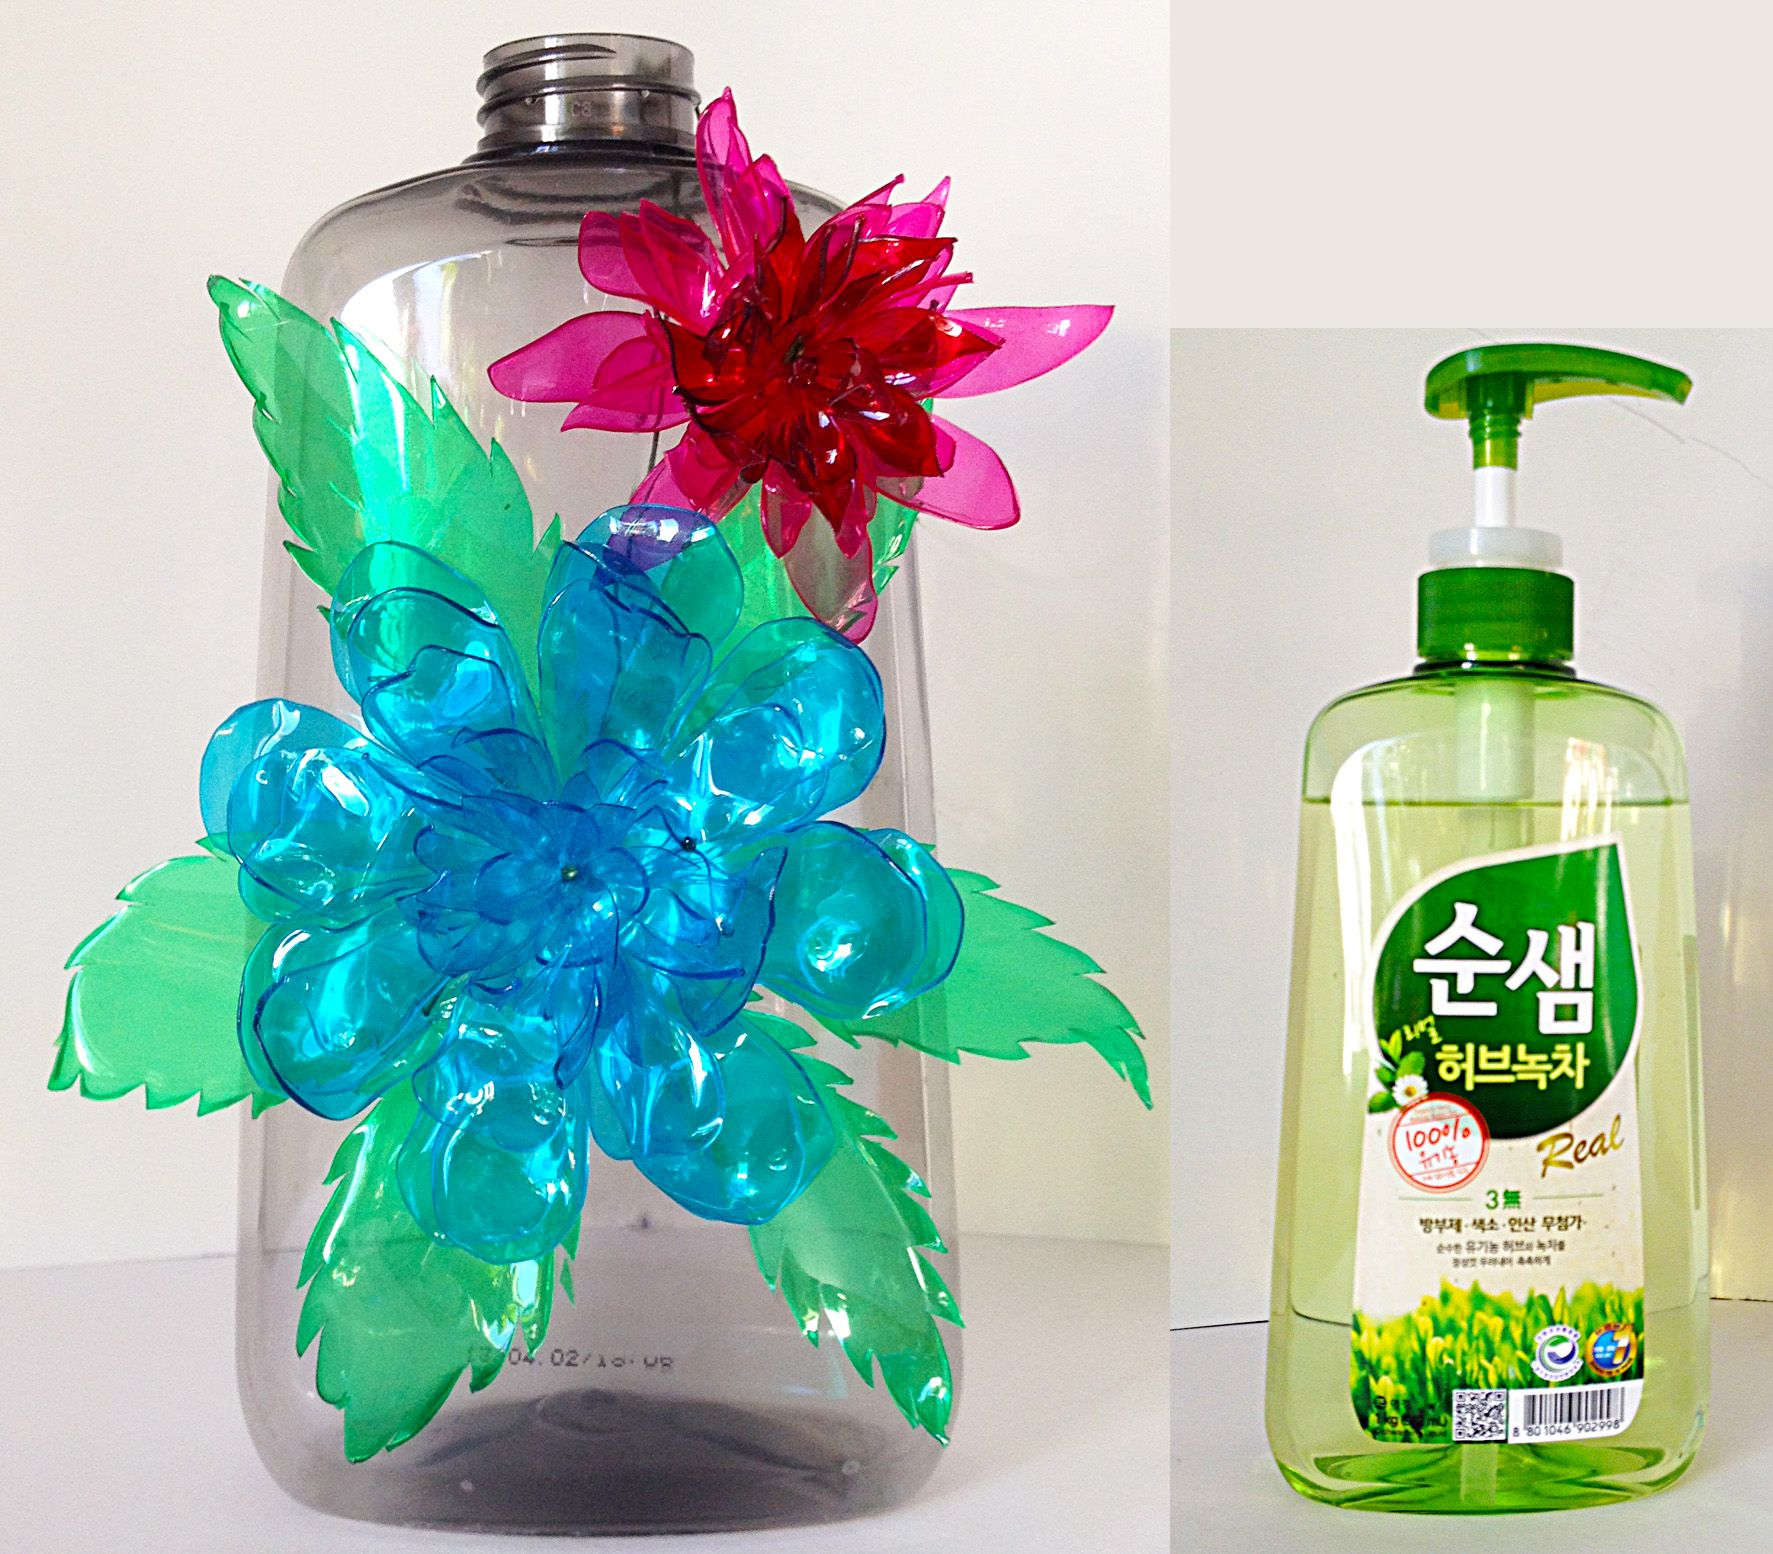 Dishwashing Detergent Bottle Recycle Plastic Bottles Flowers